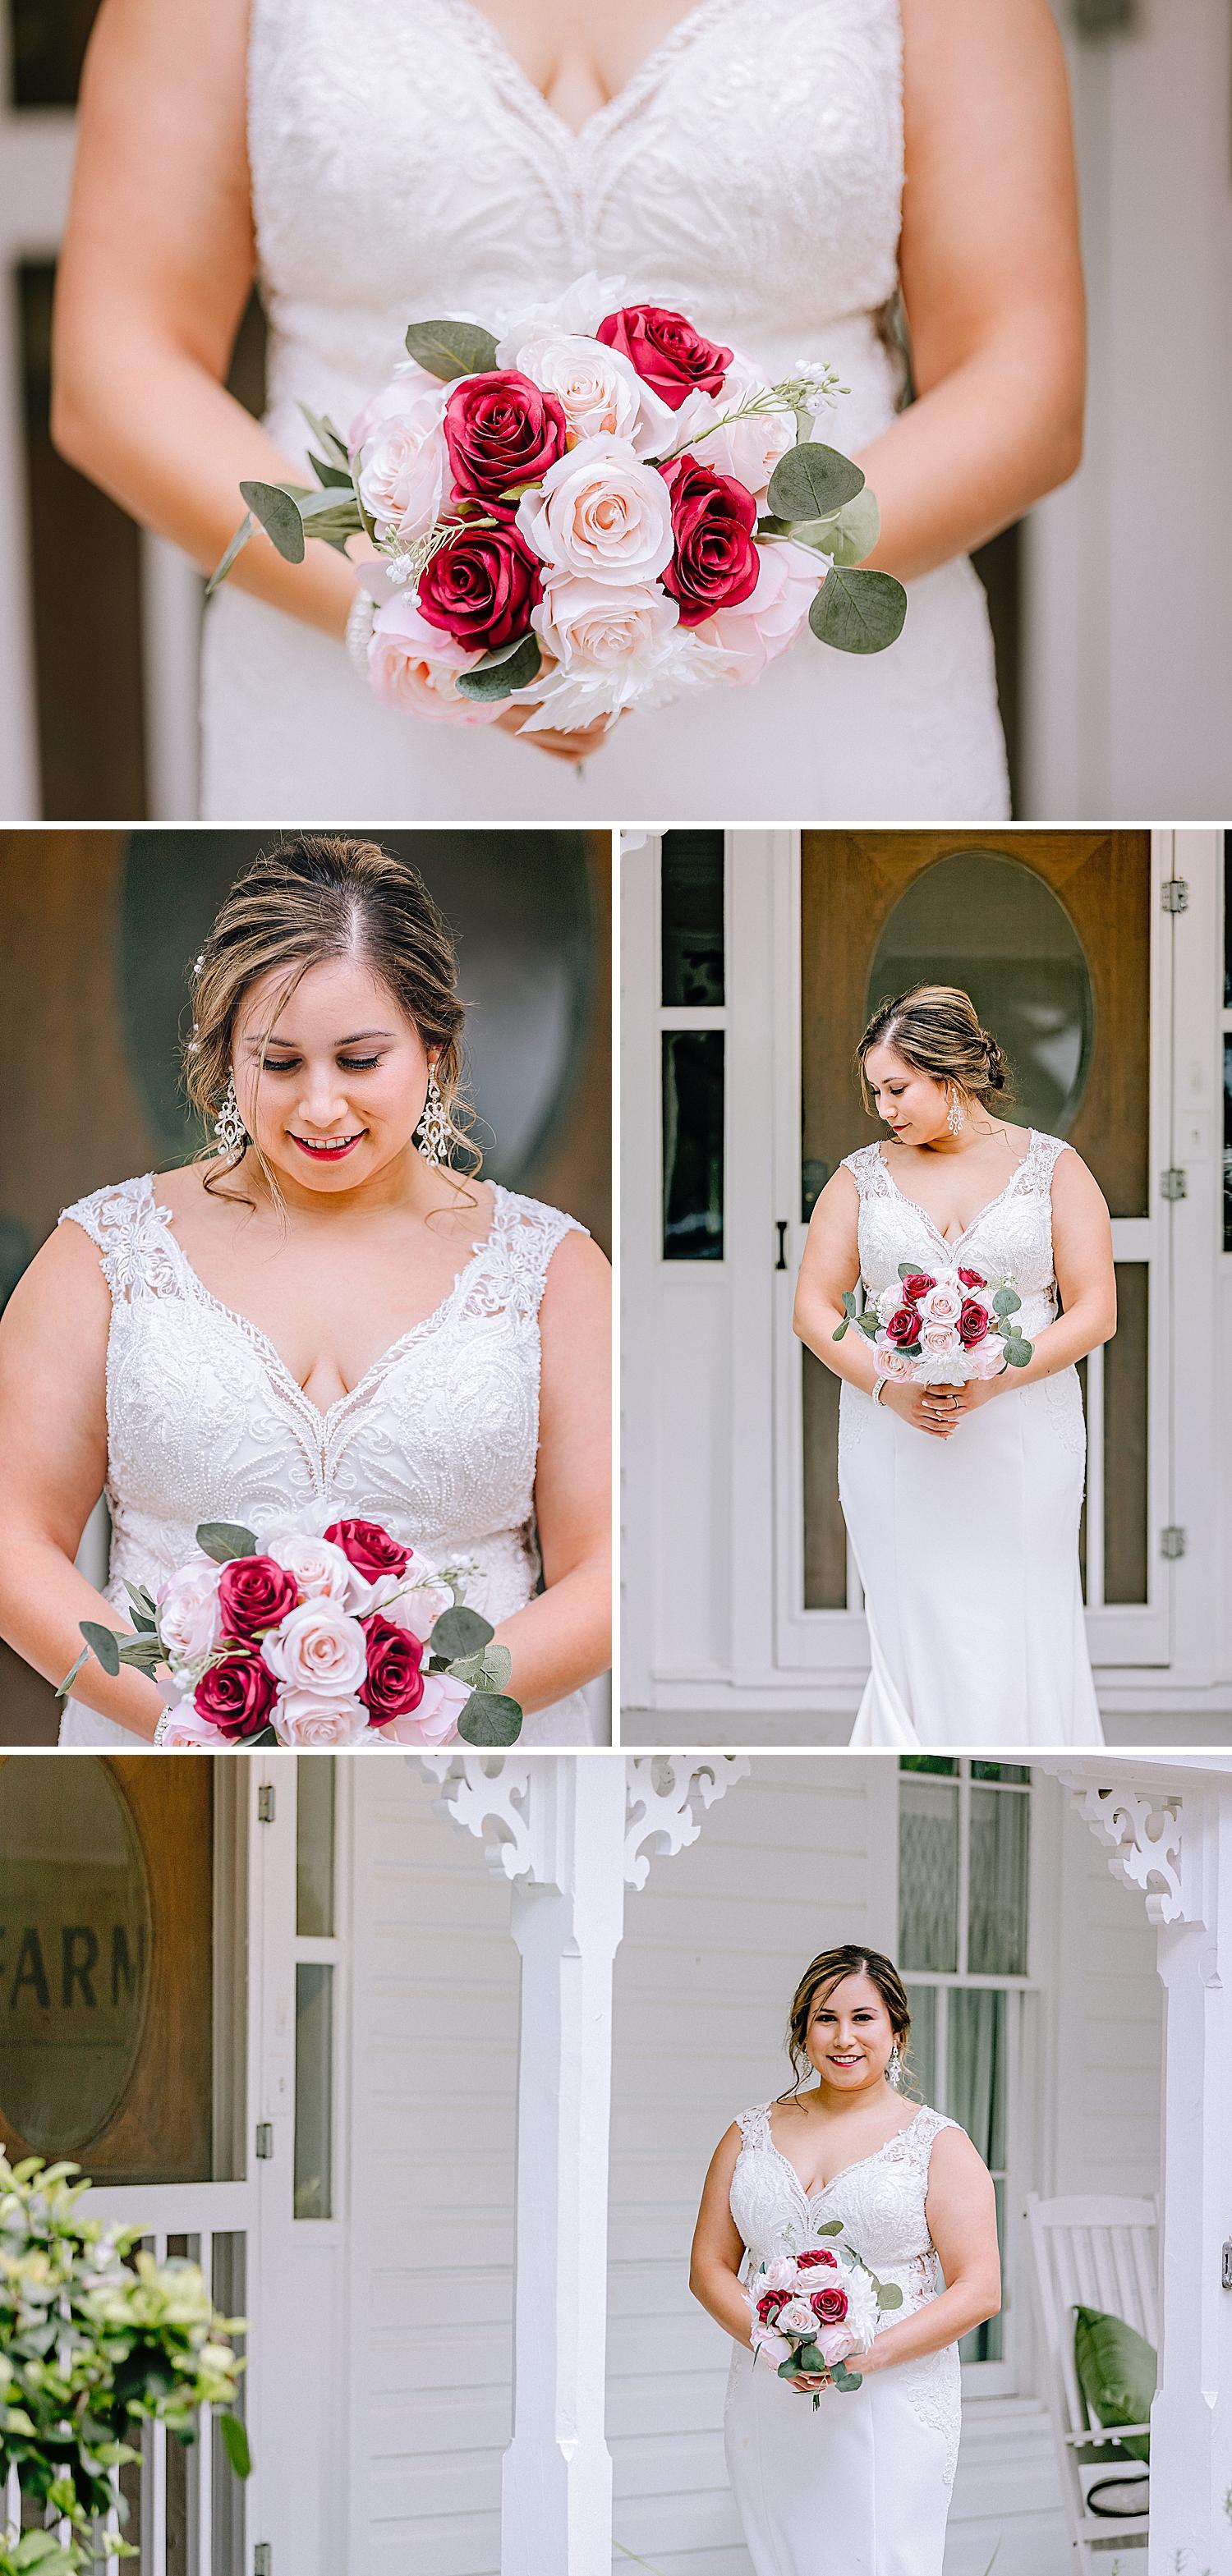 Carly-Barton-Photography-Gruene-Estate-Wedding-Photographer-New-Braunfels-Texas-Bridal-Session_0001.jpg